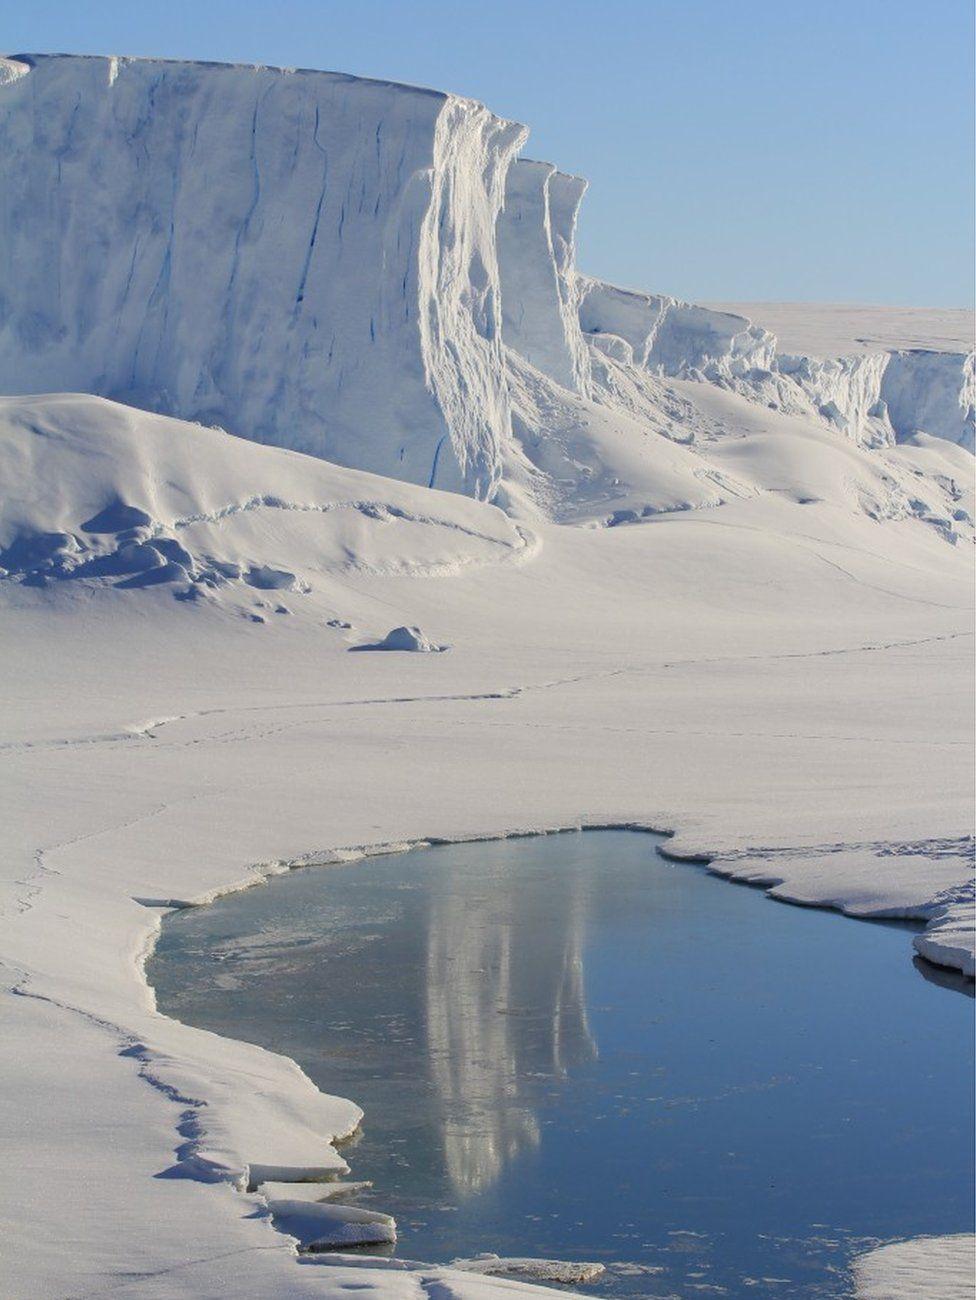 Dumont d'Urville Station, Coastal Antarctica